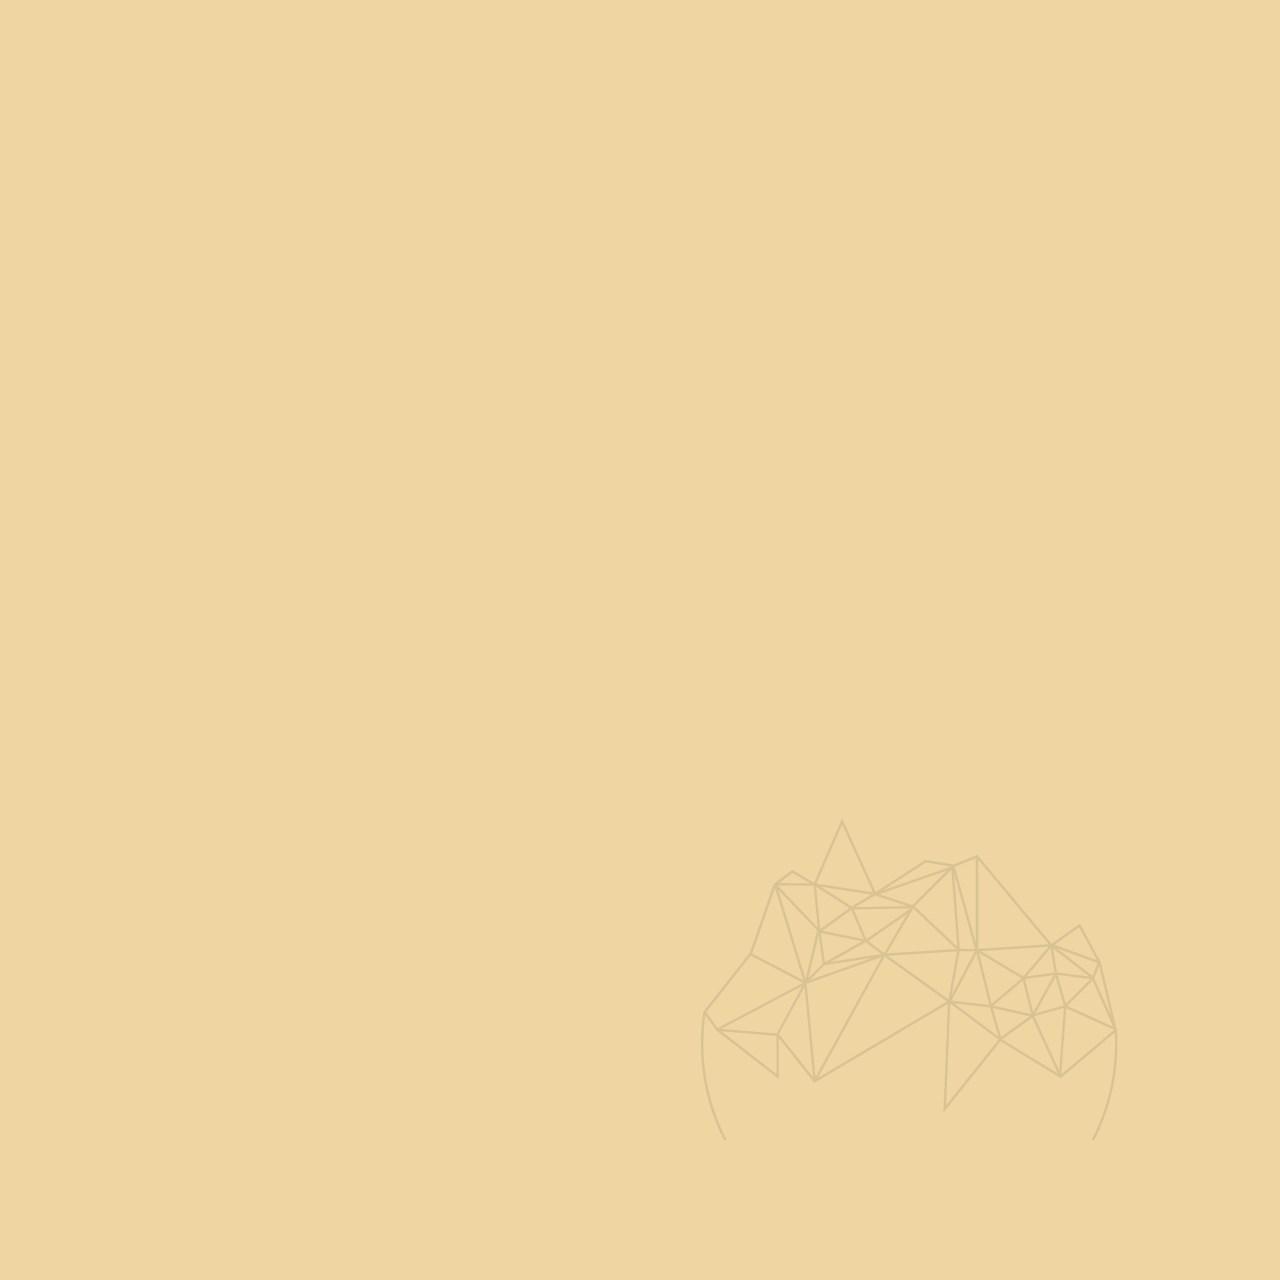 Weber Color Perfect Morel 5 KG - Flexible wall & floor grout